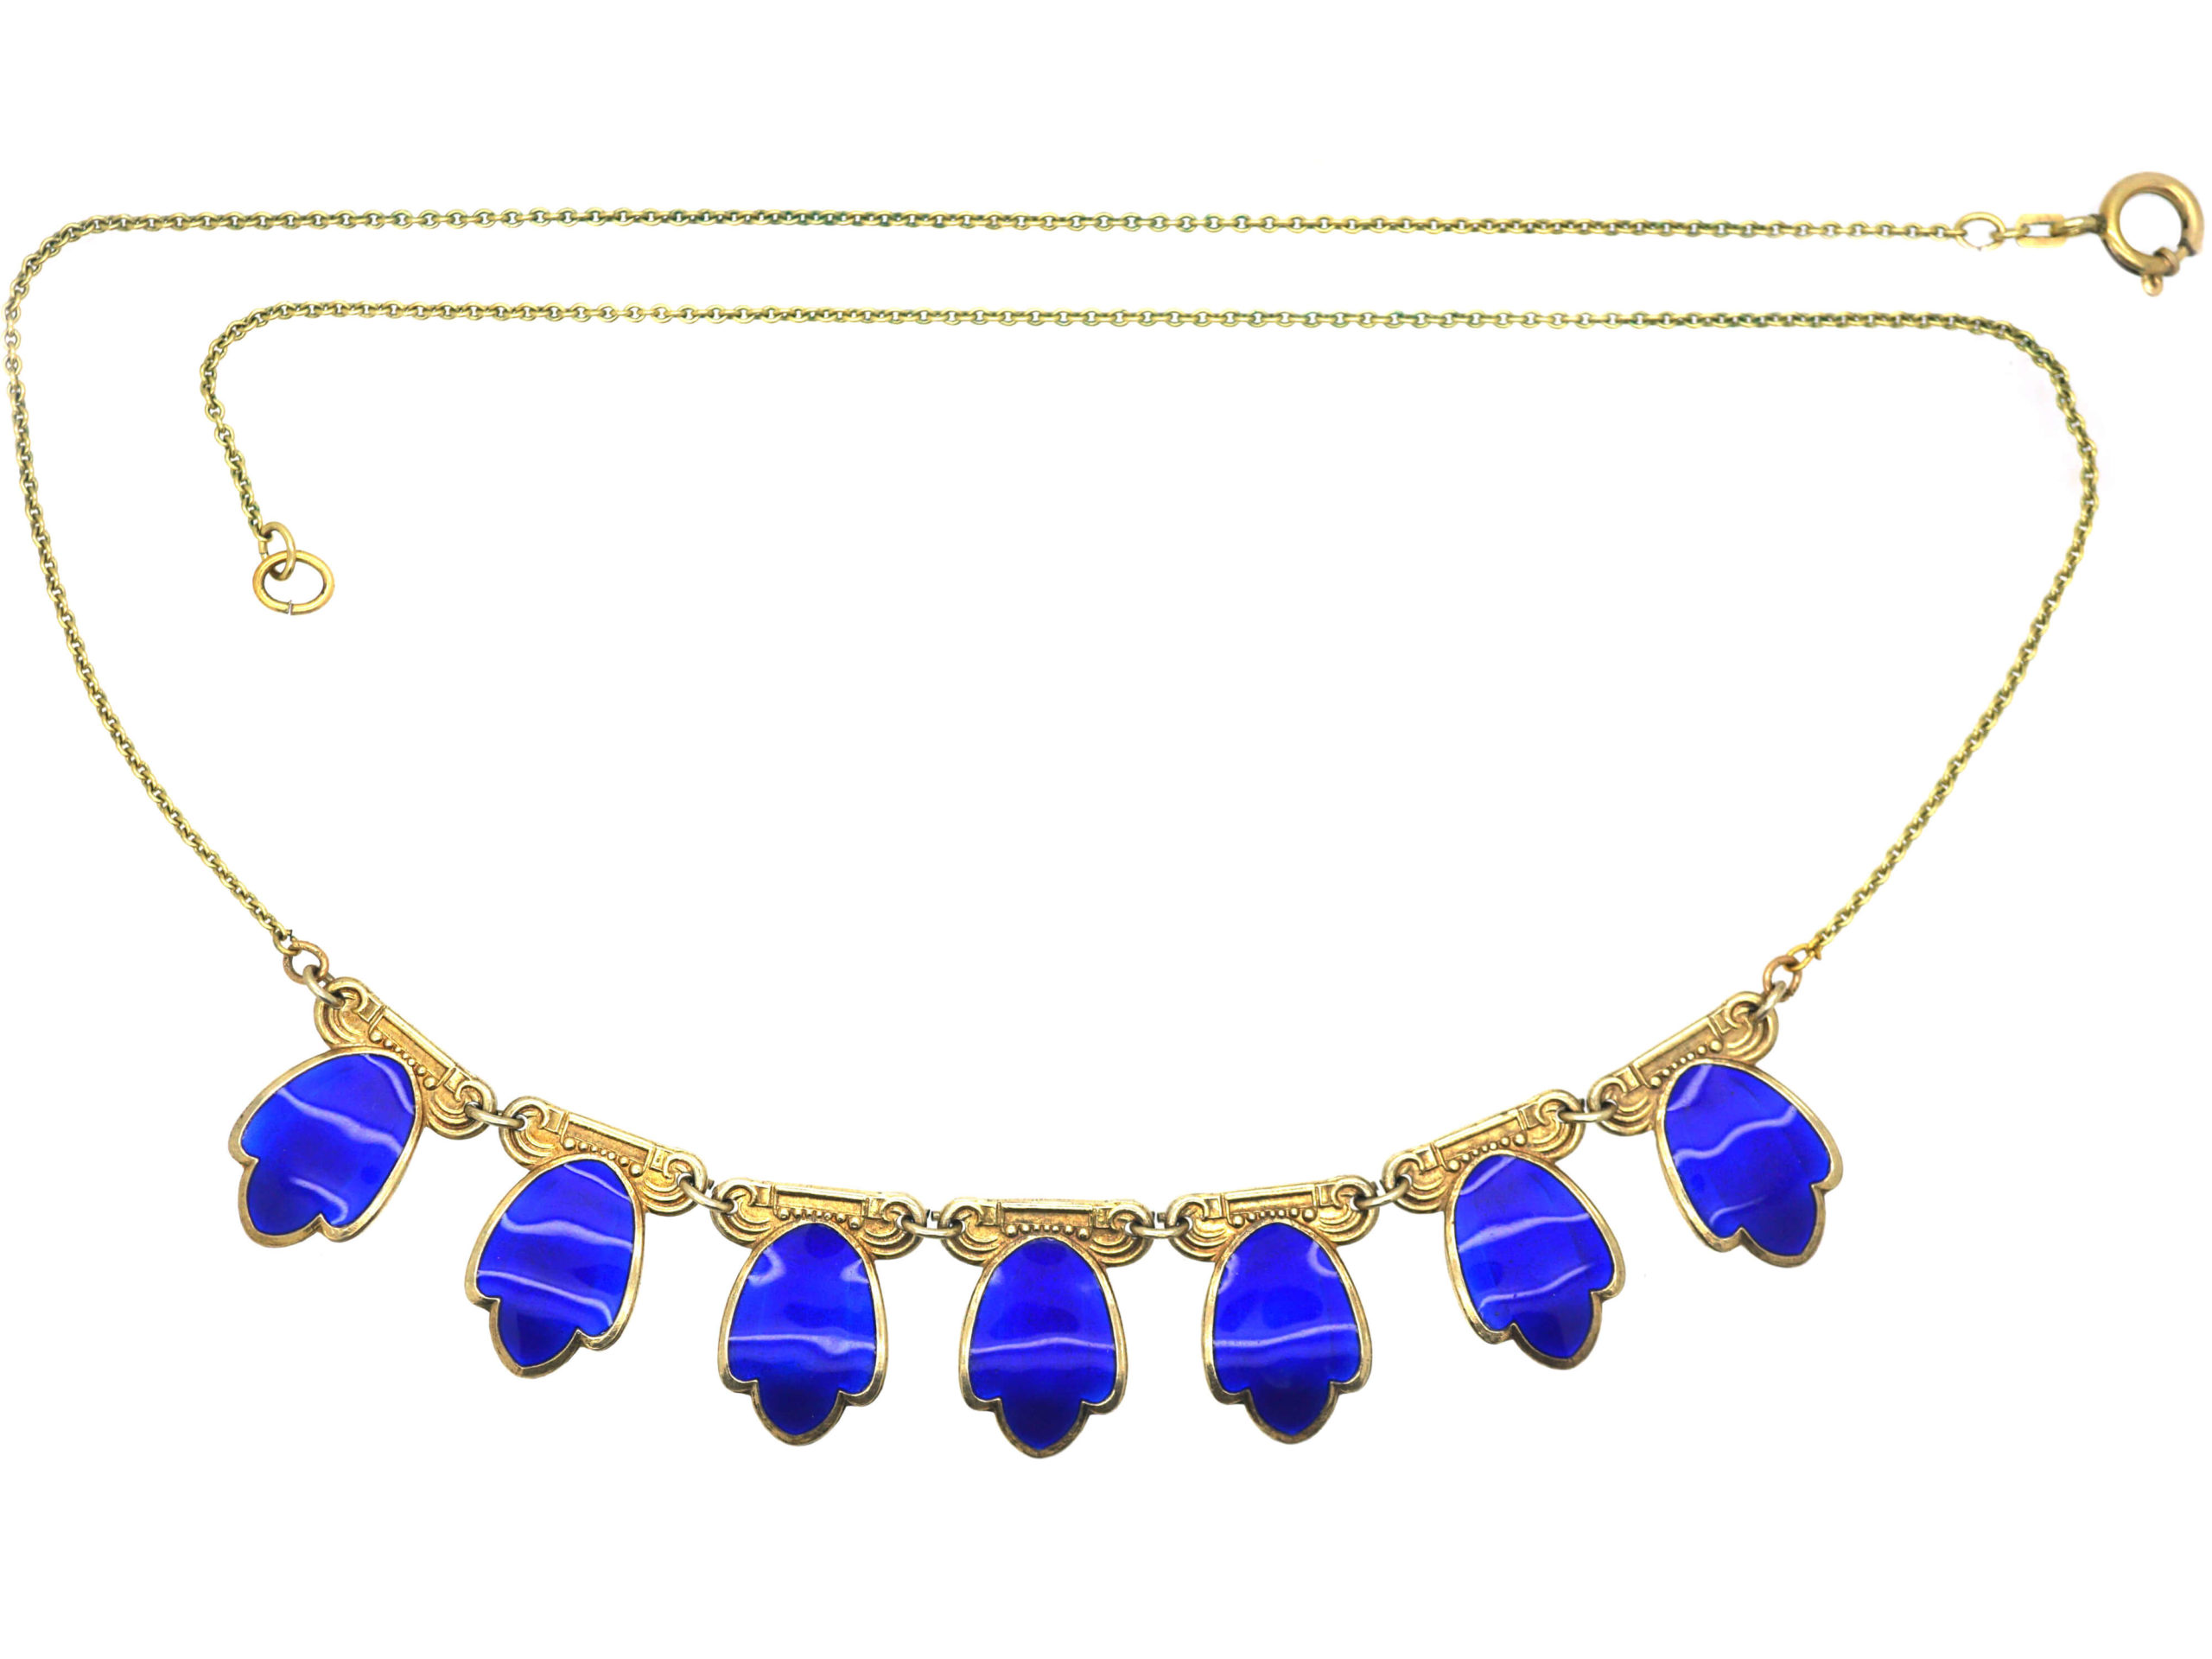 Silver Gilt & Blue Enamel Tulip Necklace by Andresen & Scheinpflug